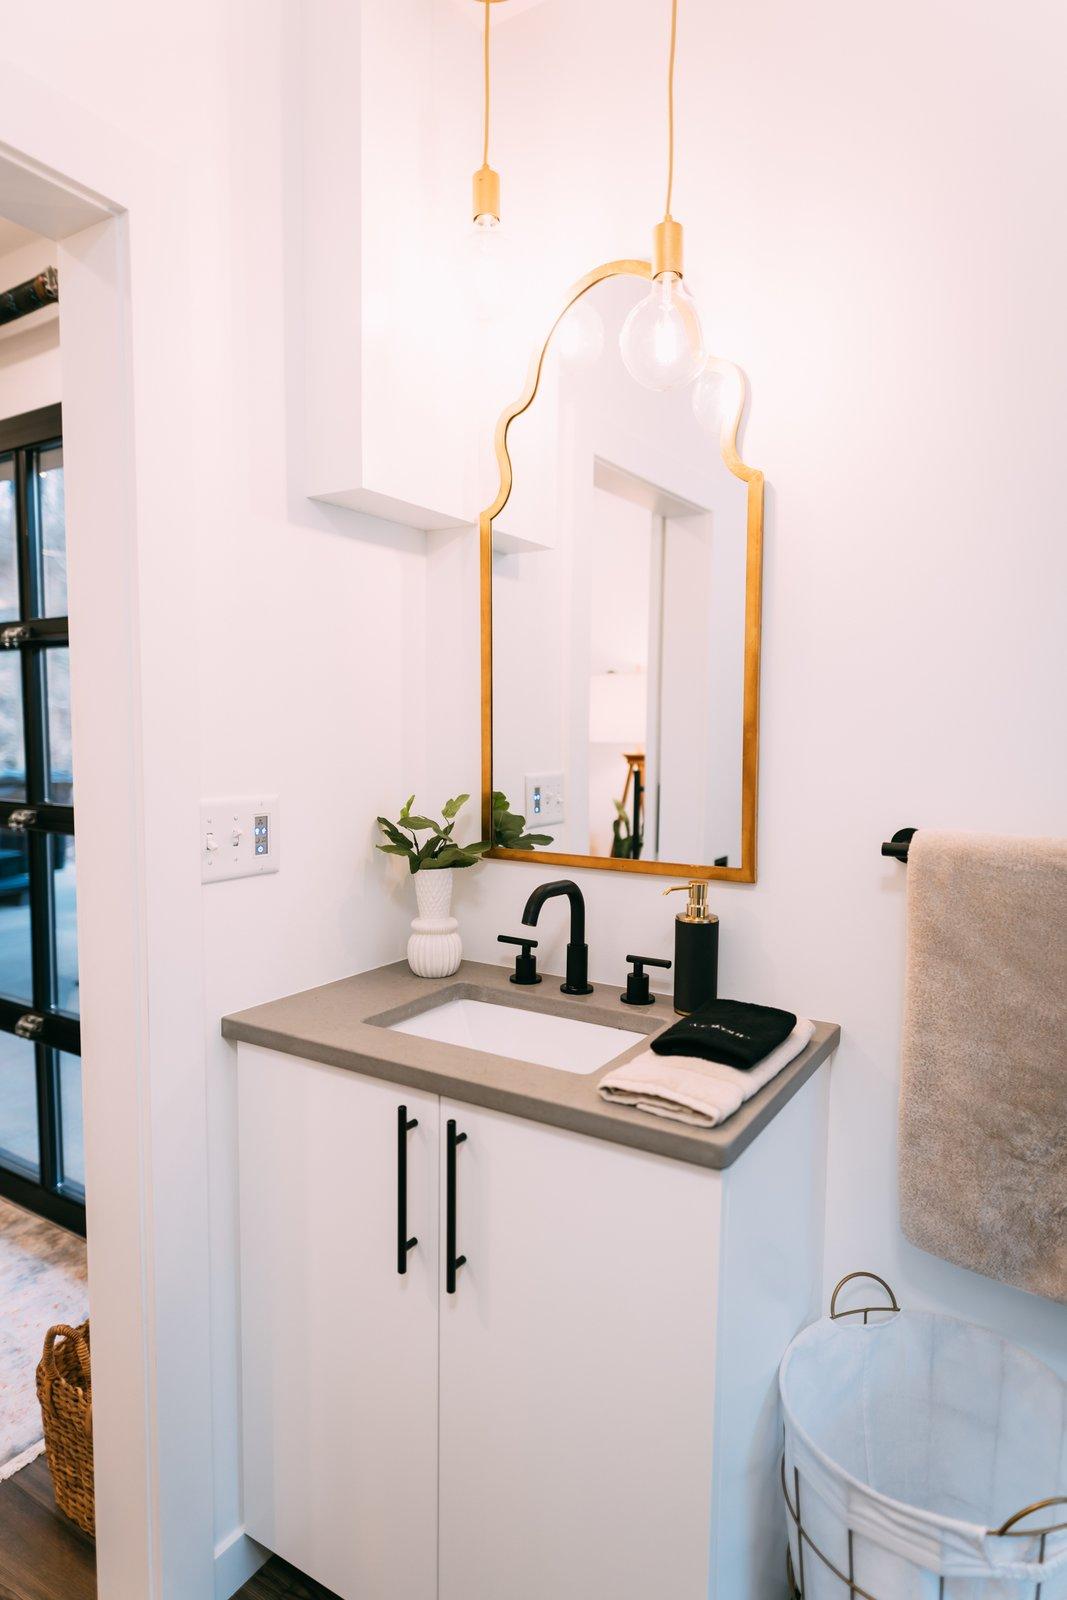 The Lily Pad Creative Cabinets Troy Dianna Shurtz bathroom